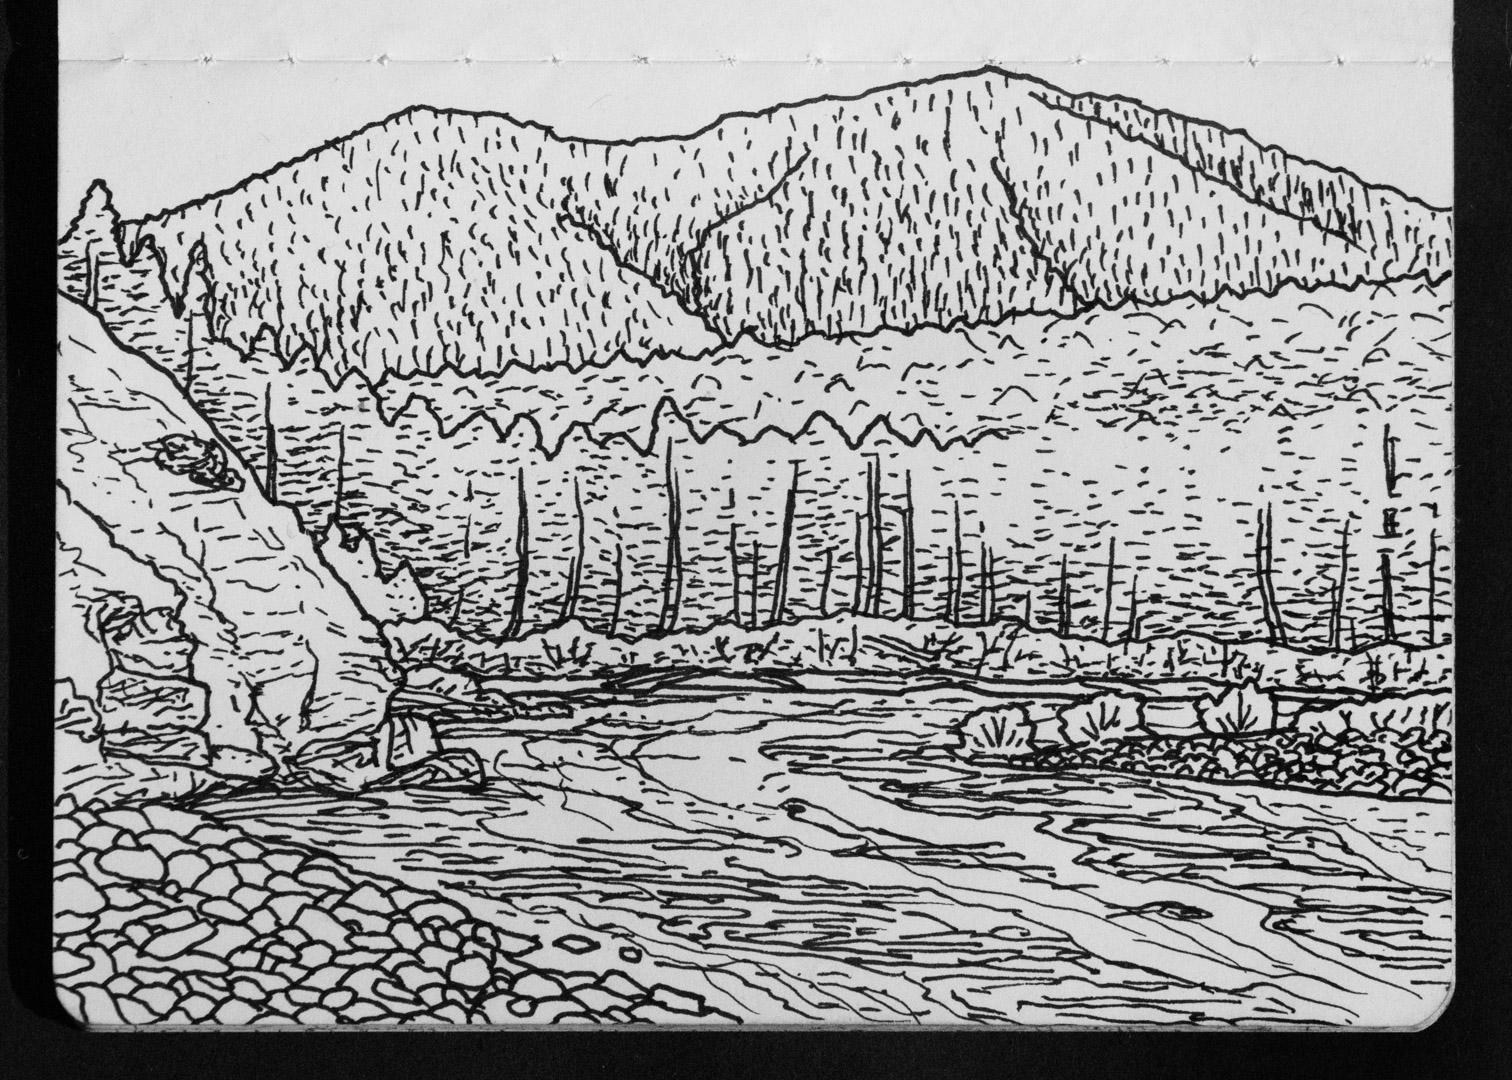 01-12 Flathead Middle Fork, Logan Dirtyface Crossing.jpg